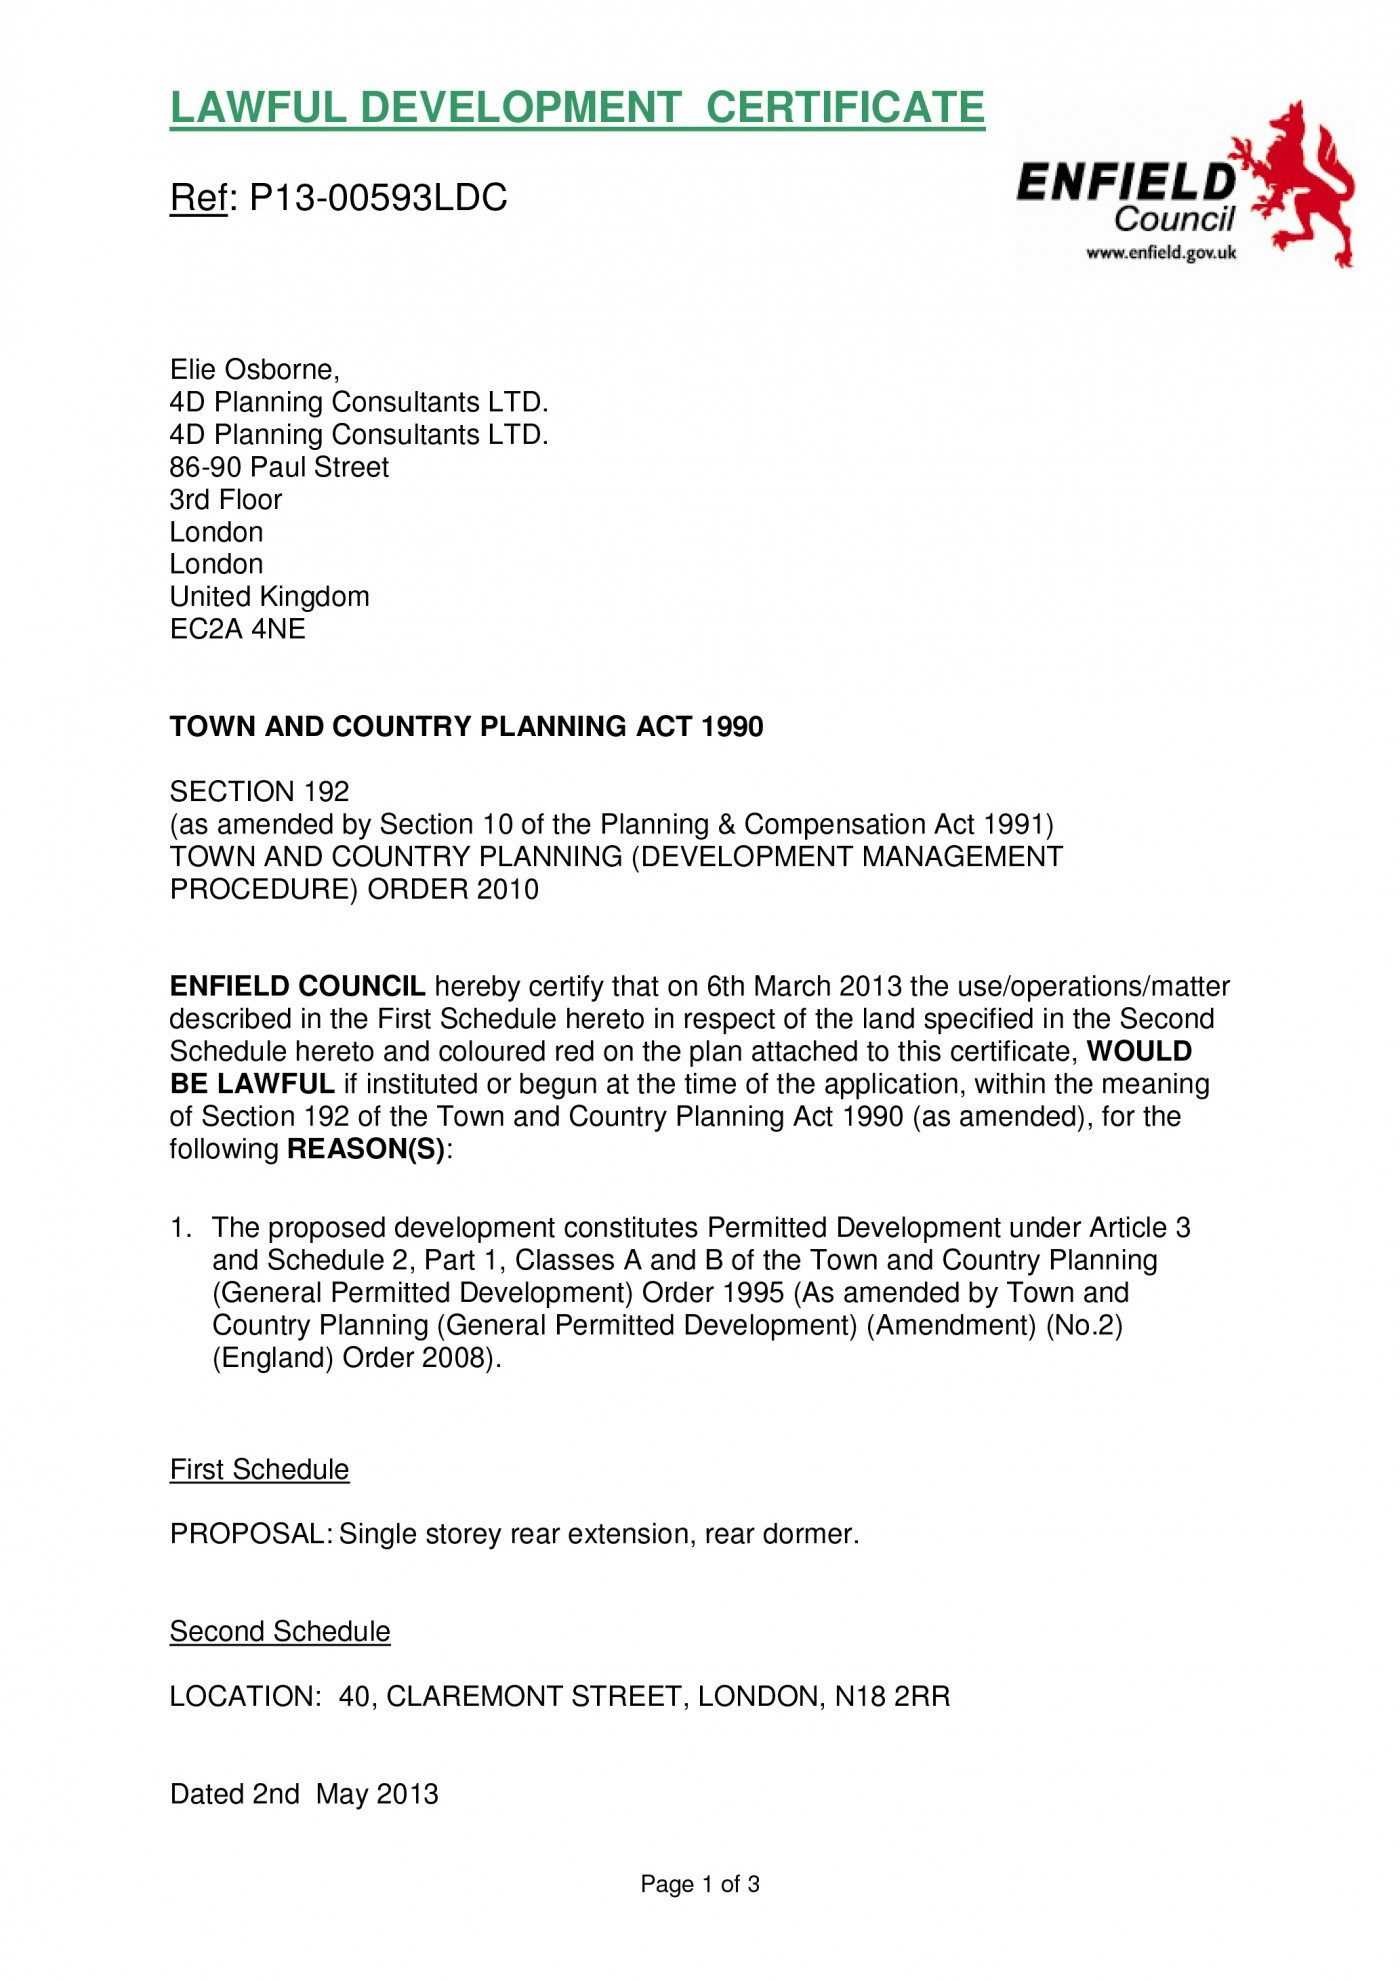 decision notice - Enfield Council - single storey rear extension, rear dormer